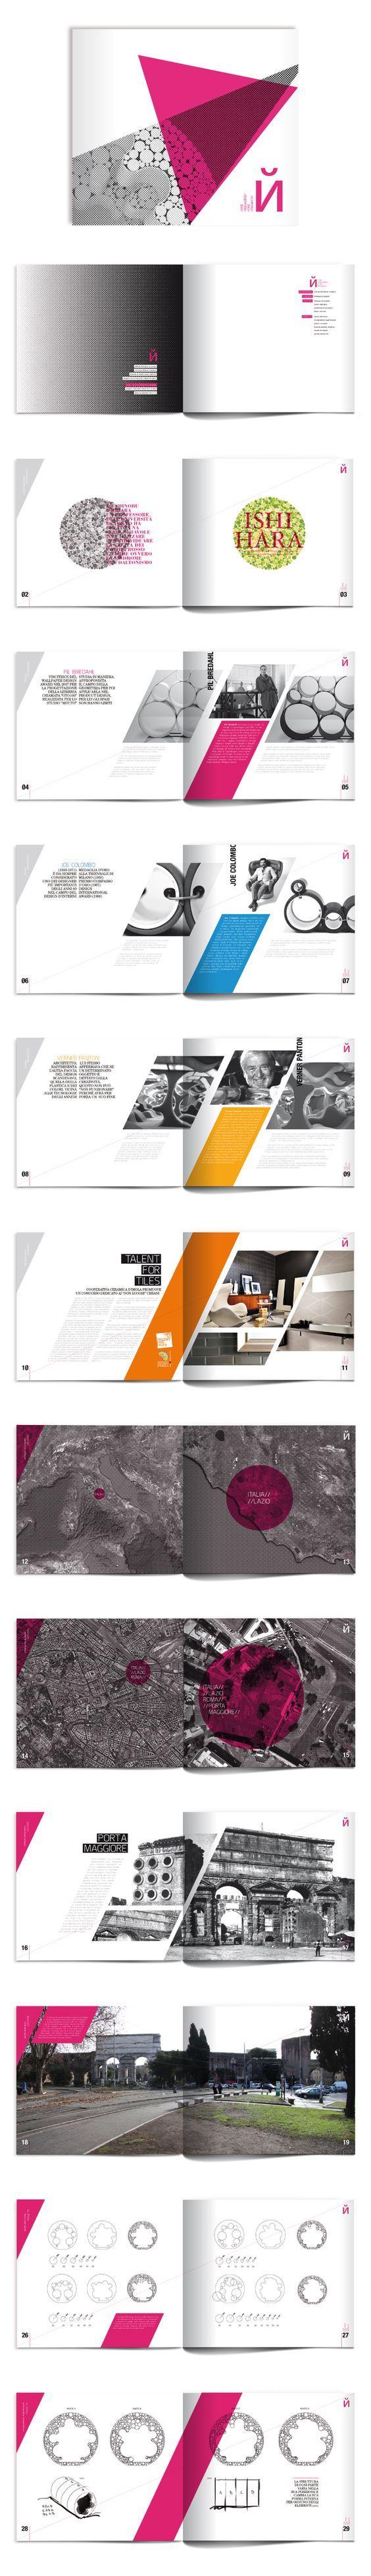 Get your Broshore design within 24 hour. http://www.mxd.design/